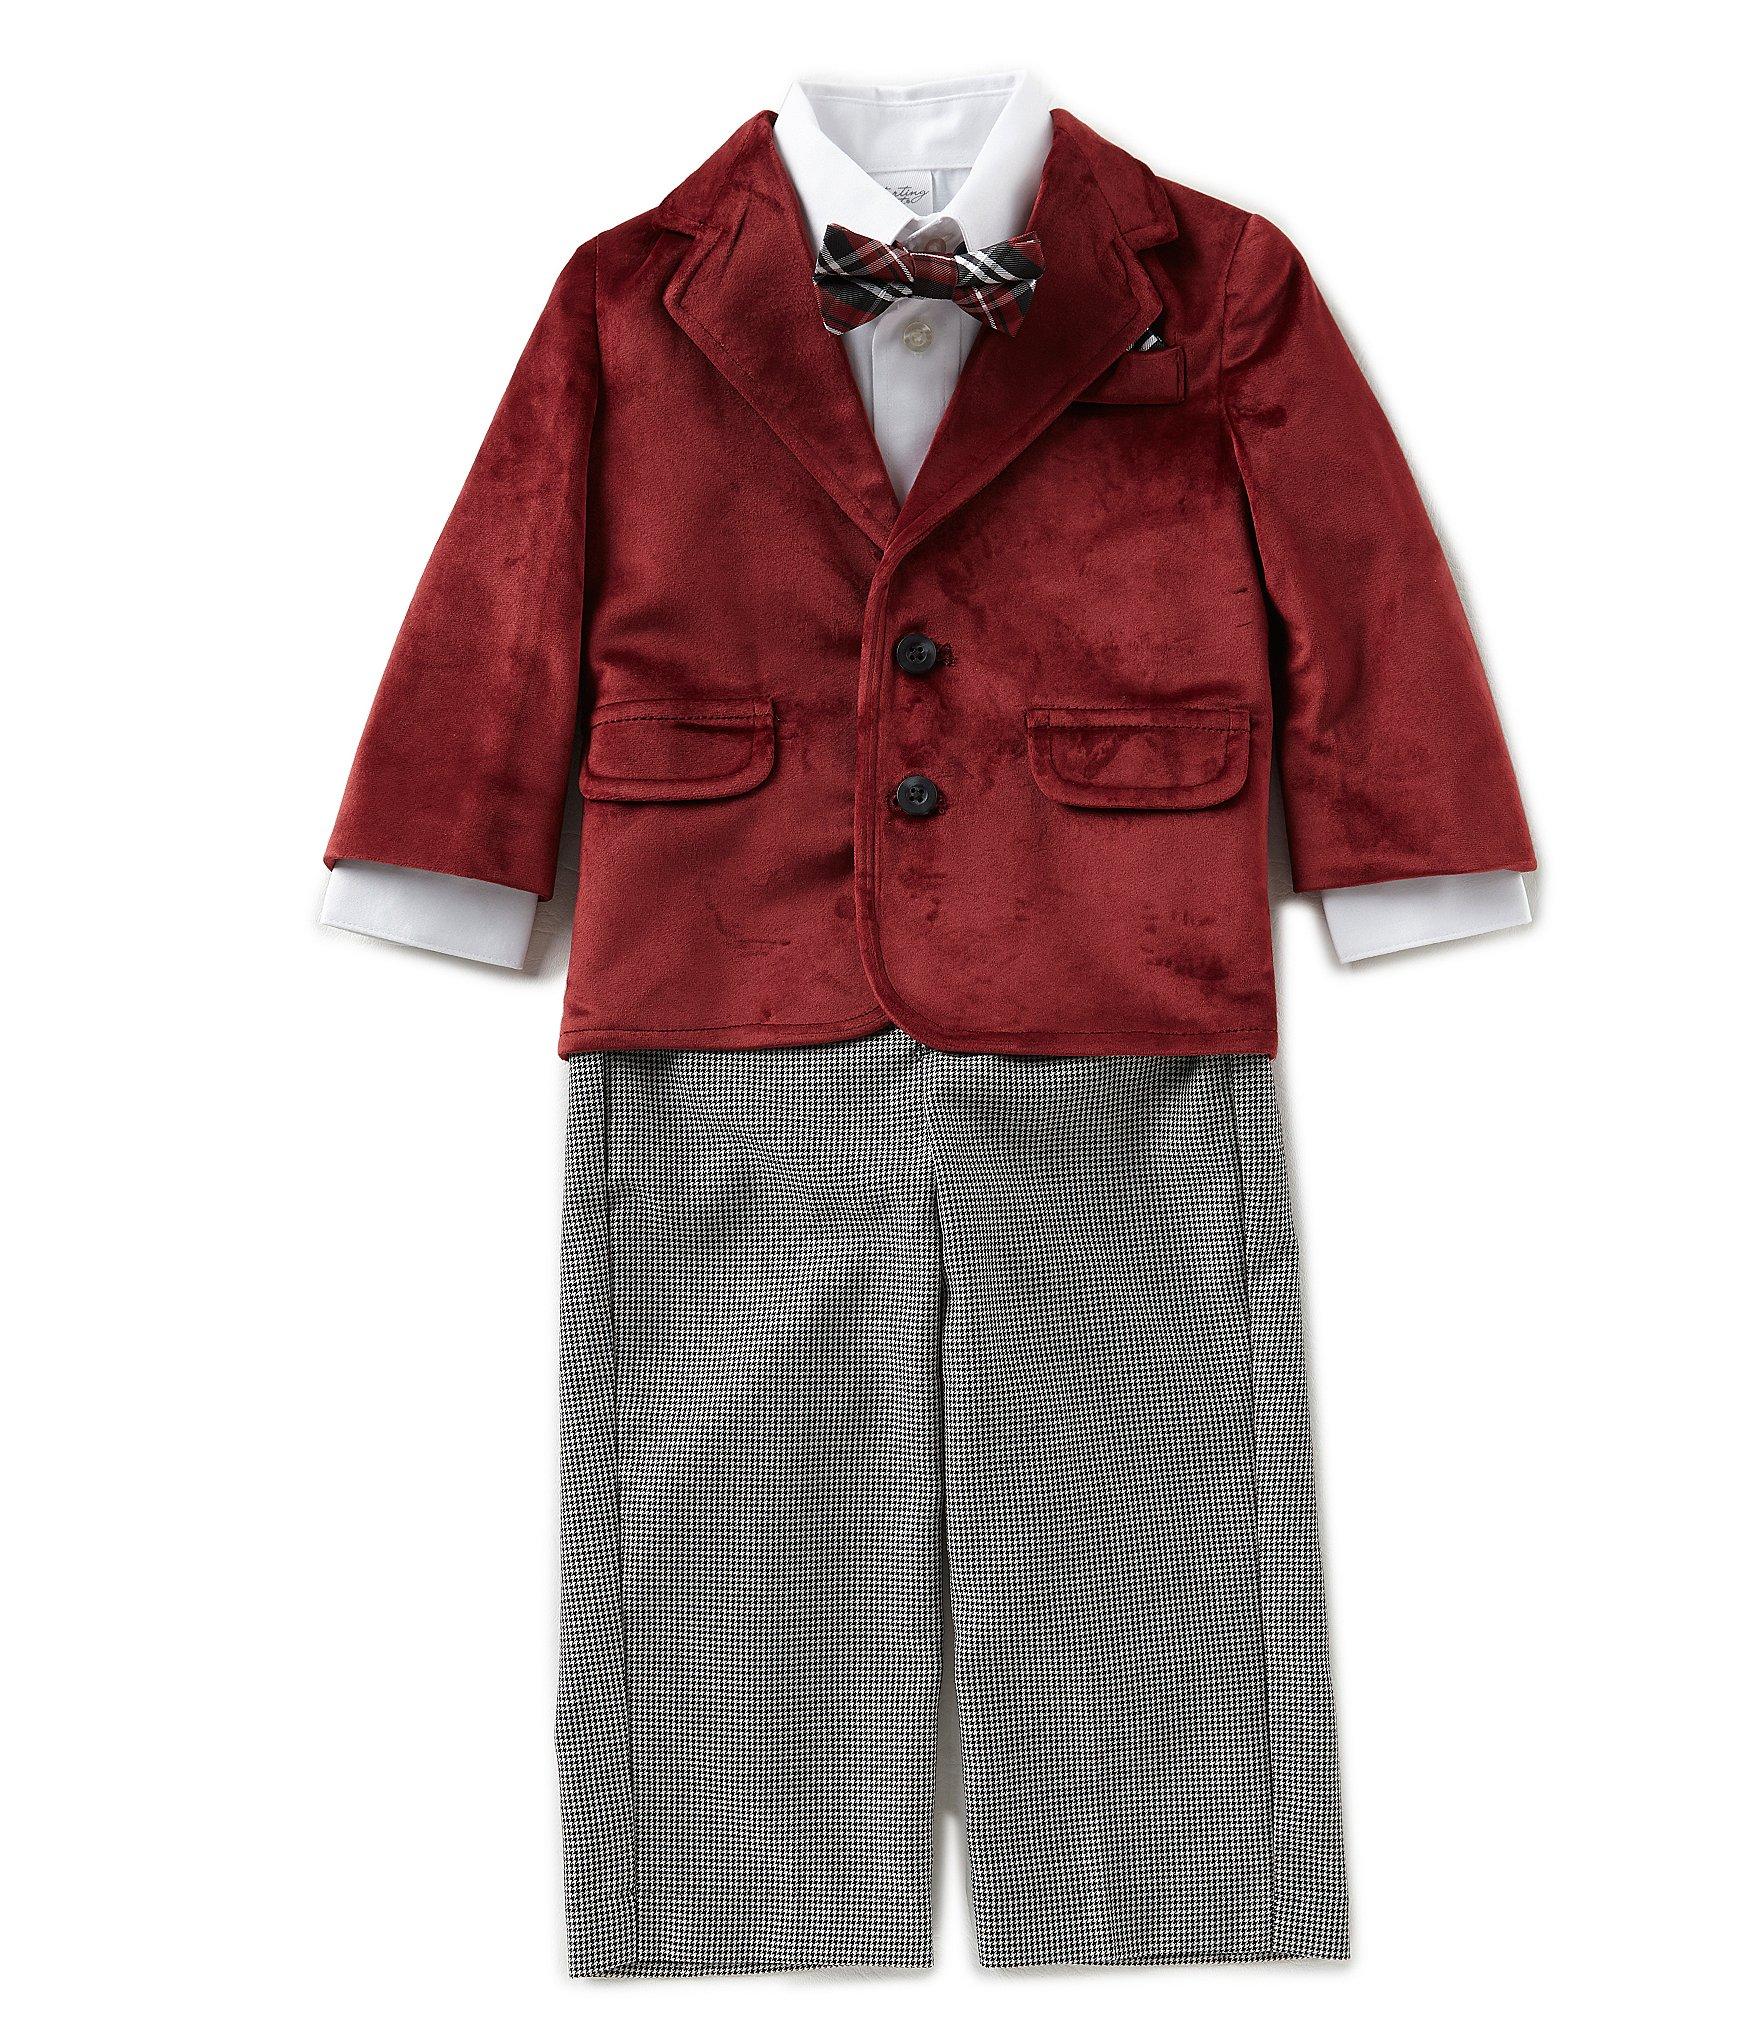 Starting out baby boys 12 24 months velvet jacket button for Red velvet button up shirt